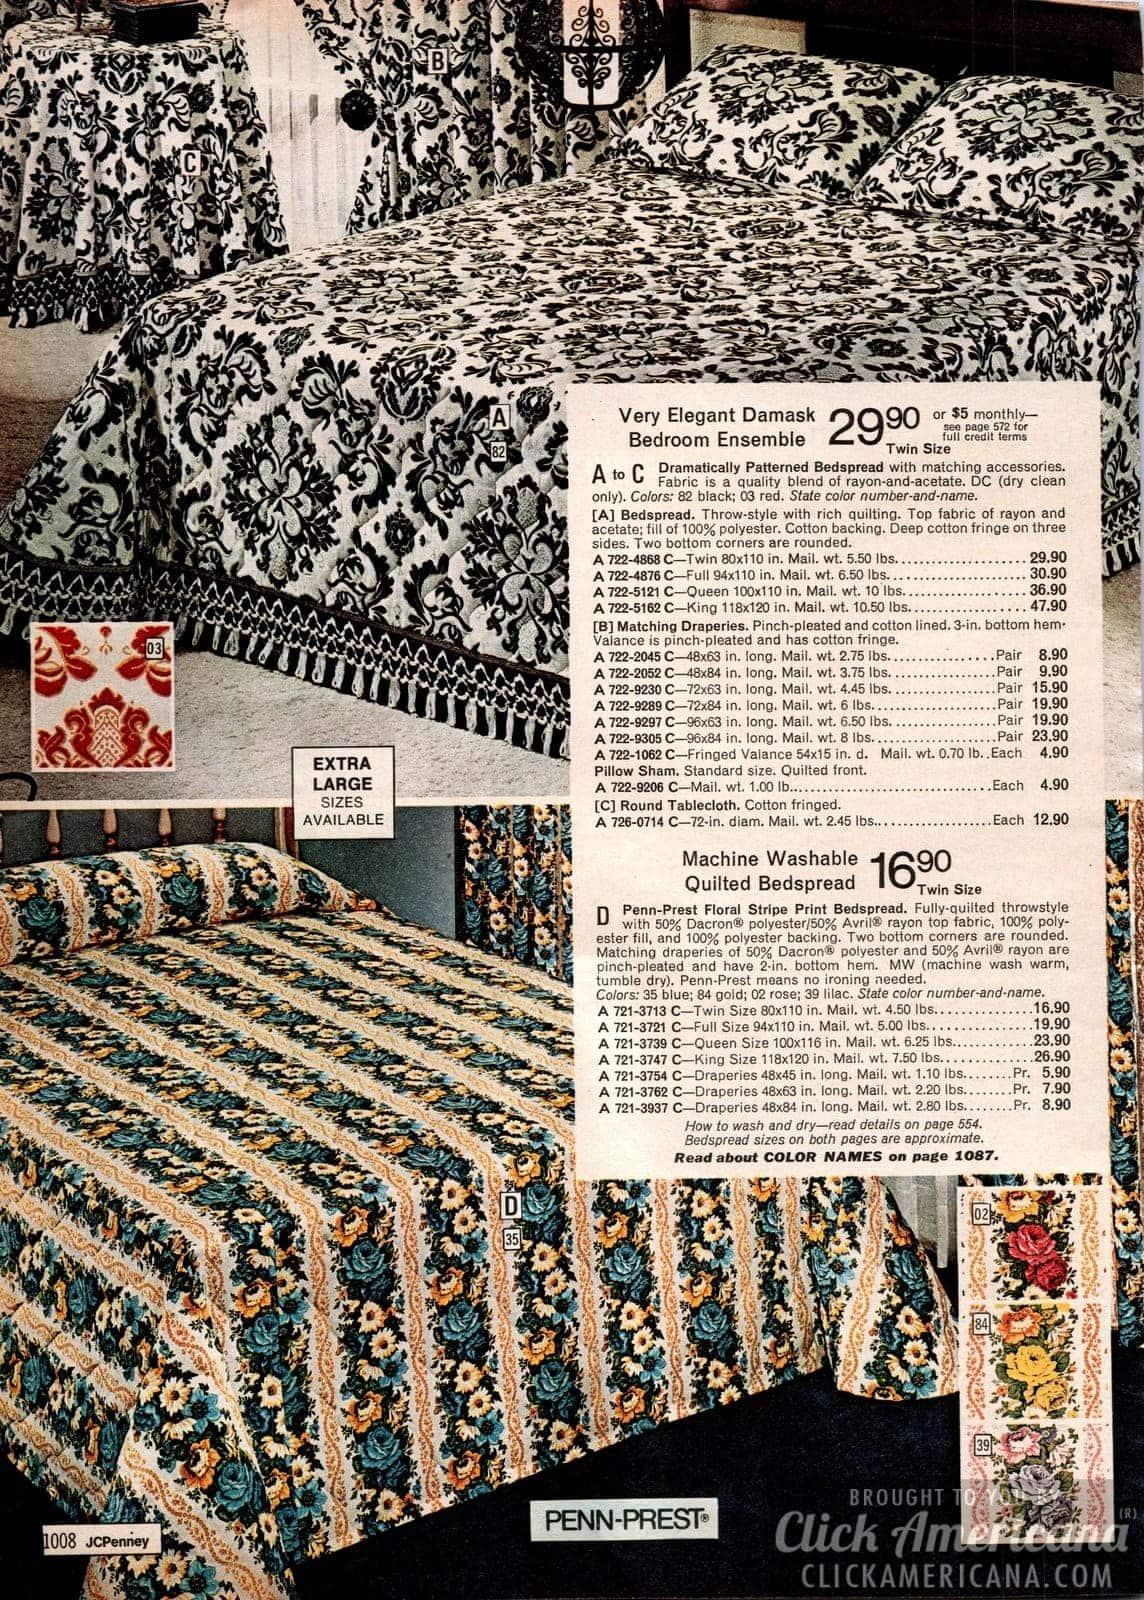 Elegant damask bedroom ensemble and Penn-Prest floral stripe decor